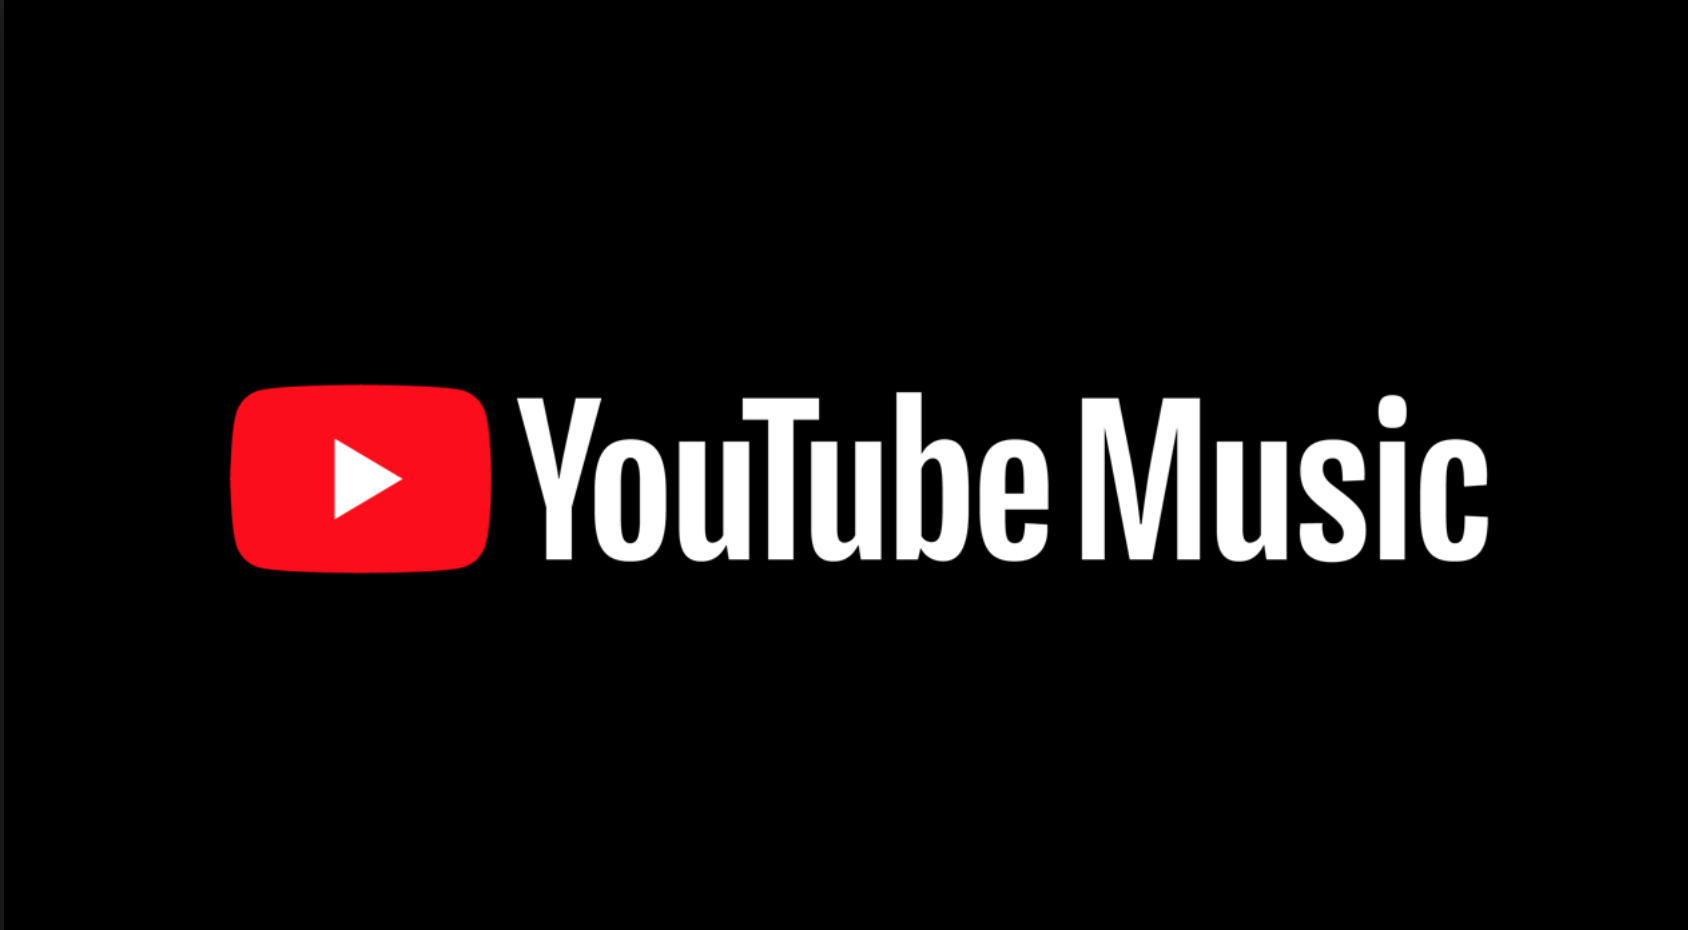 YouTubeMusicとは?使い方・料金を徹底解説